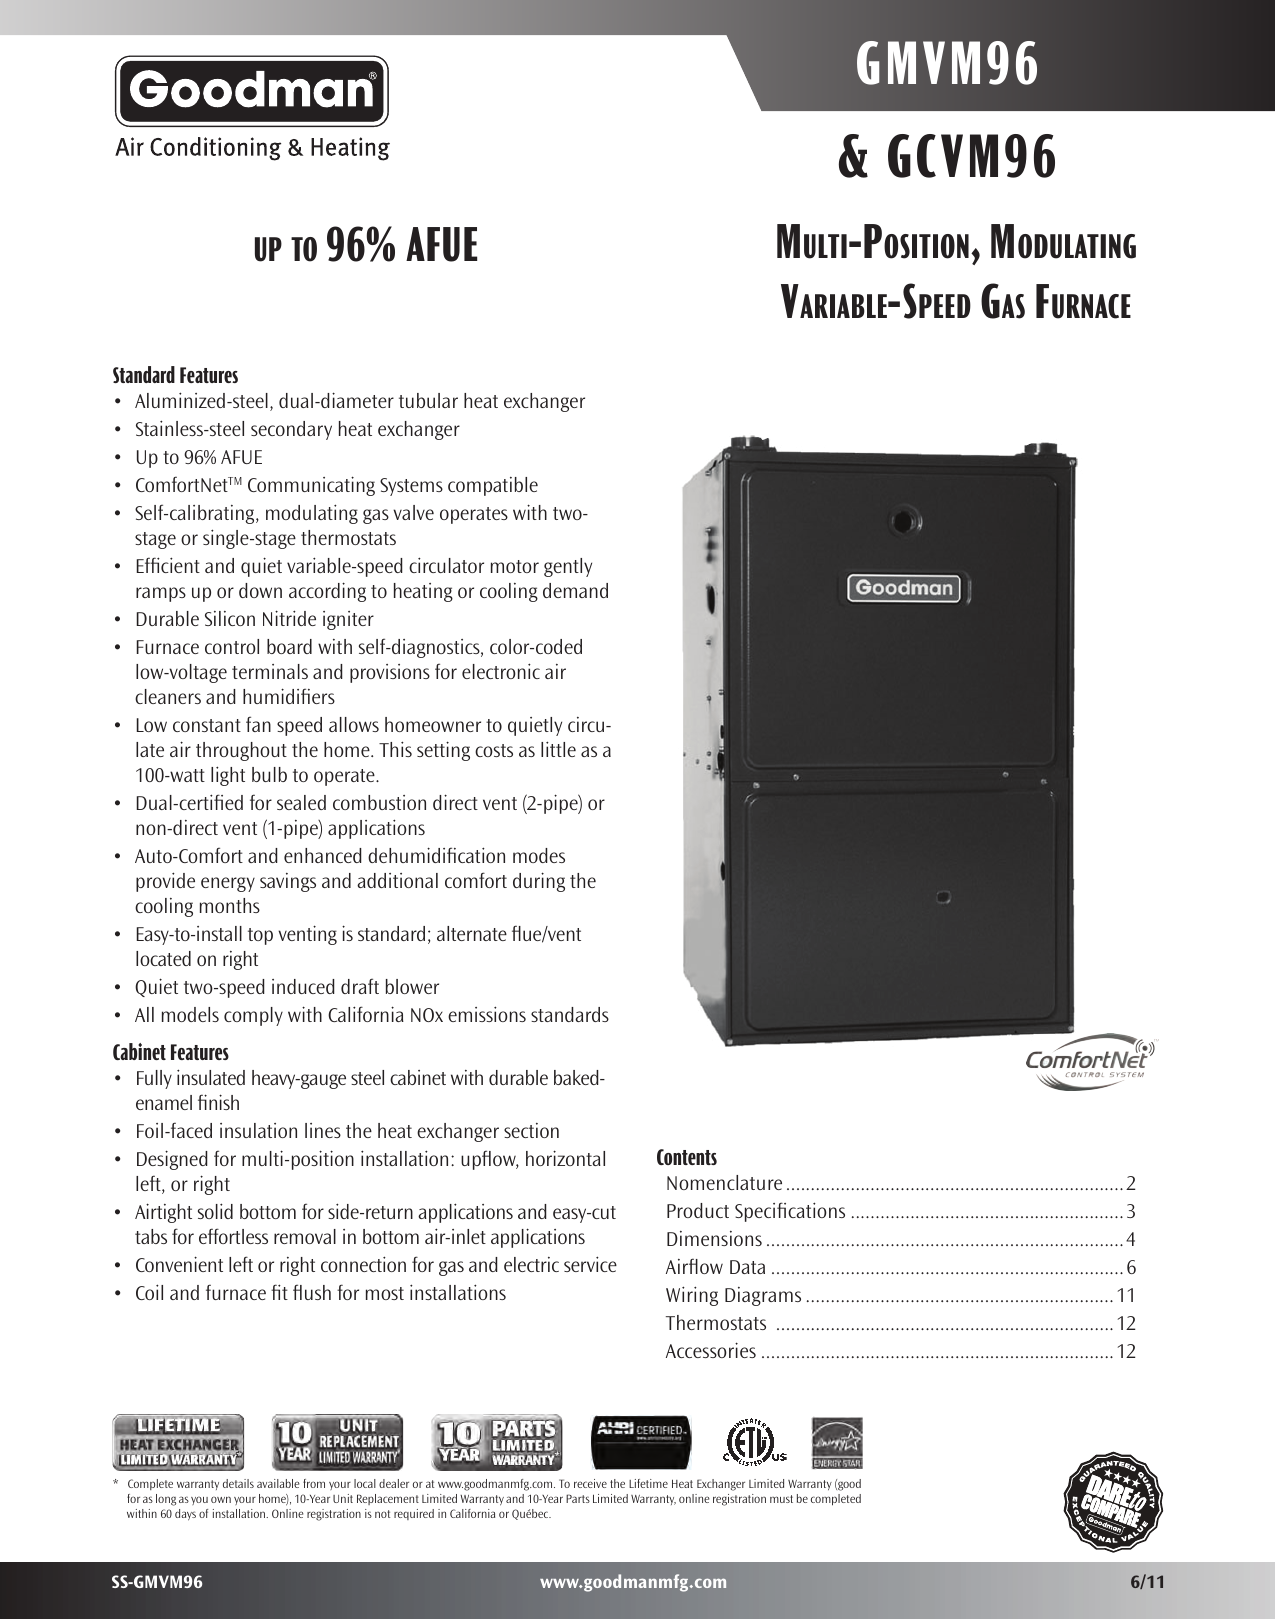 Goodman Mfg Furnace Gmvm96 User Guide Manual Guide